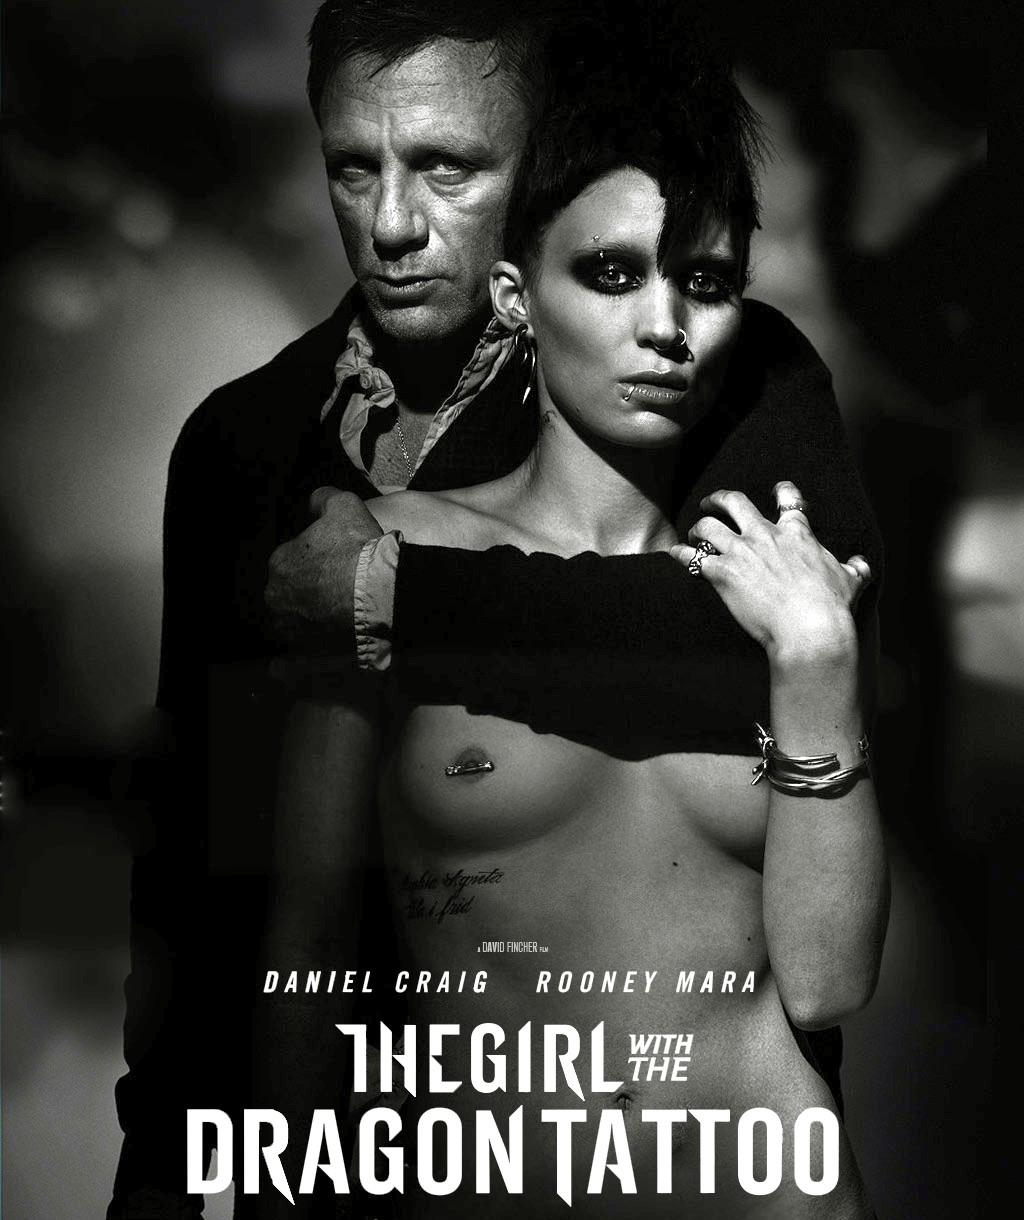 http://4.bp.blogspot.com/-8PX2rgSrUtM/UQvso5xRs3I/AAAAAAAATrI/c3RH4X376WY/s1600/girl_with_the_dragon_tattoo_poster_daniel_craig_rooney_mara_cartel_sin_censura_millenium_los_hombres_que_no_amaban_a_las_mujeres_Lisbeth_Salander_David_Fincher.jpg